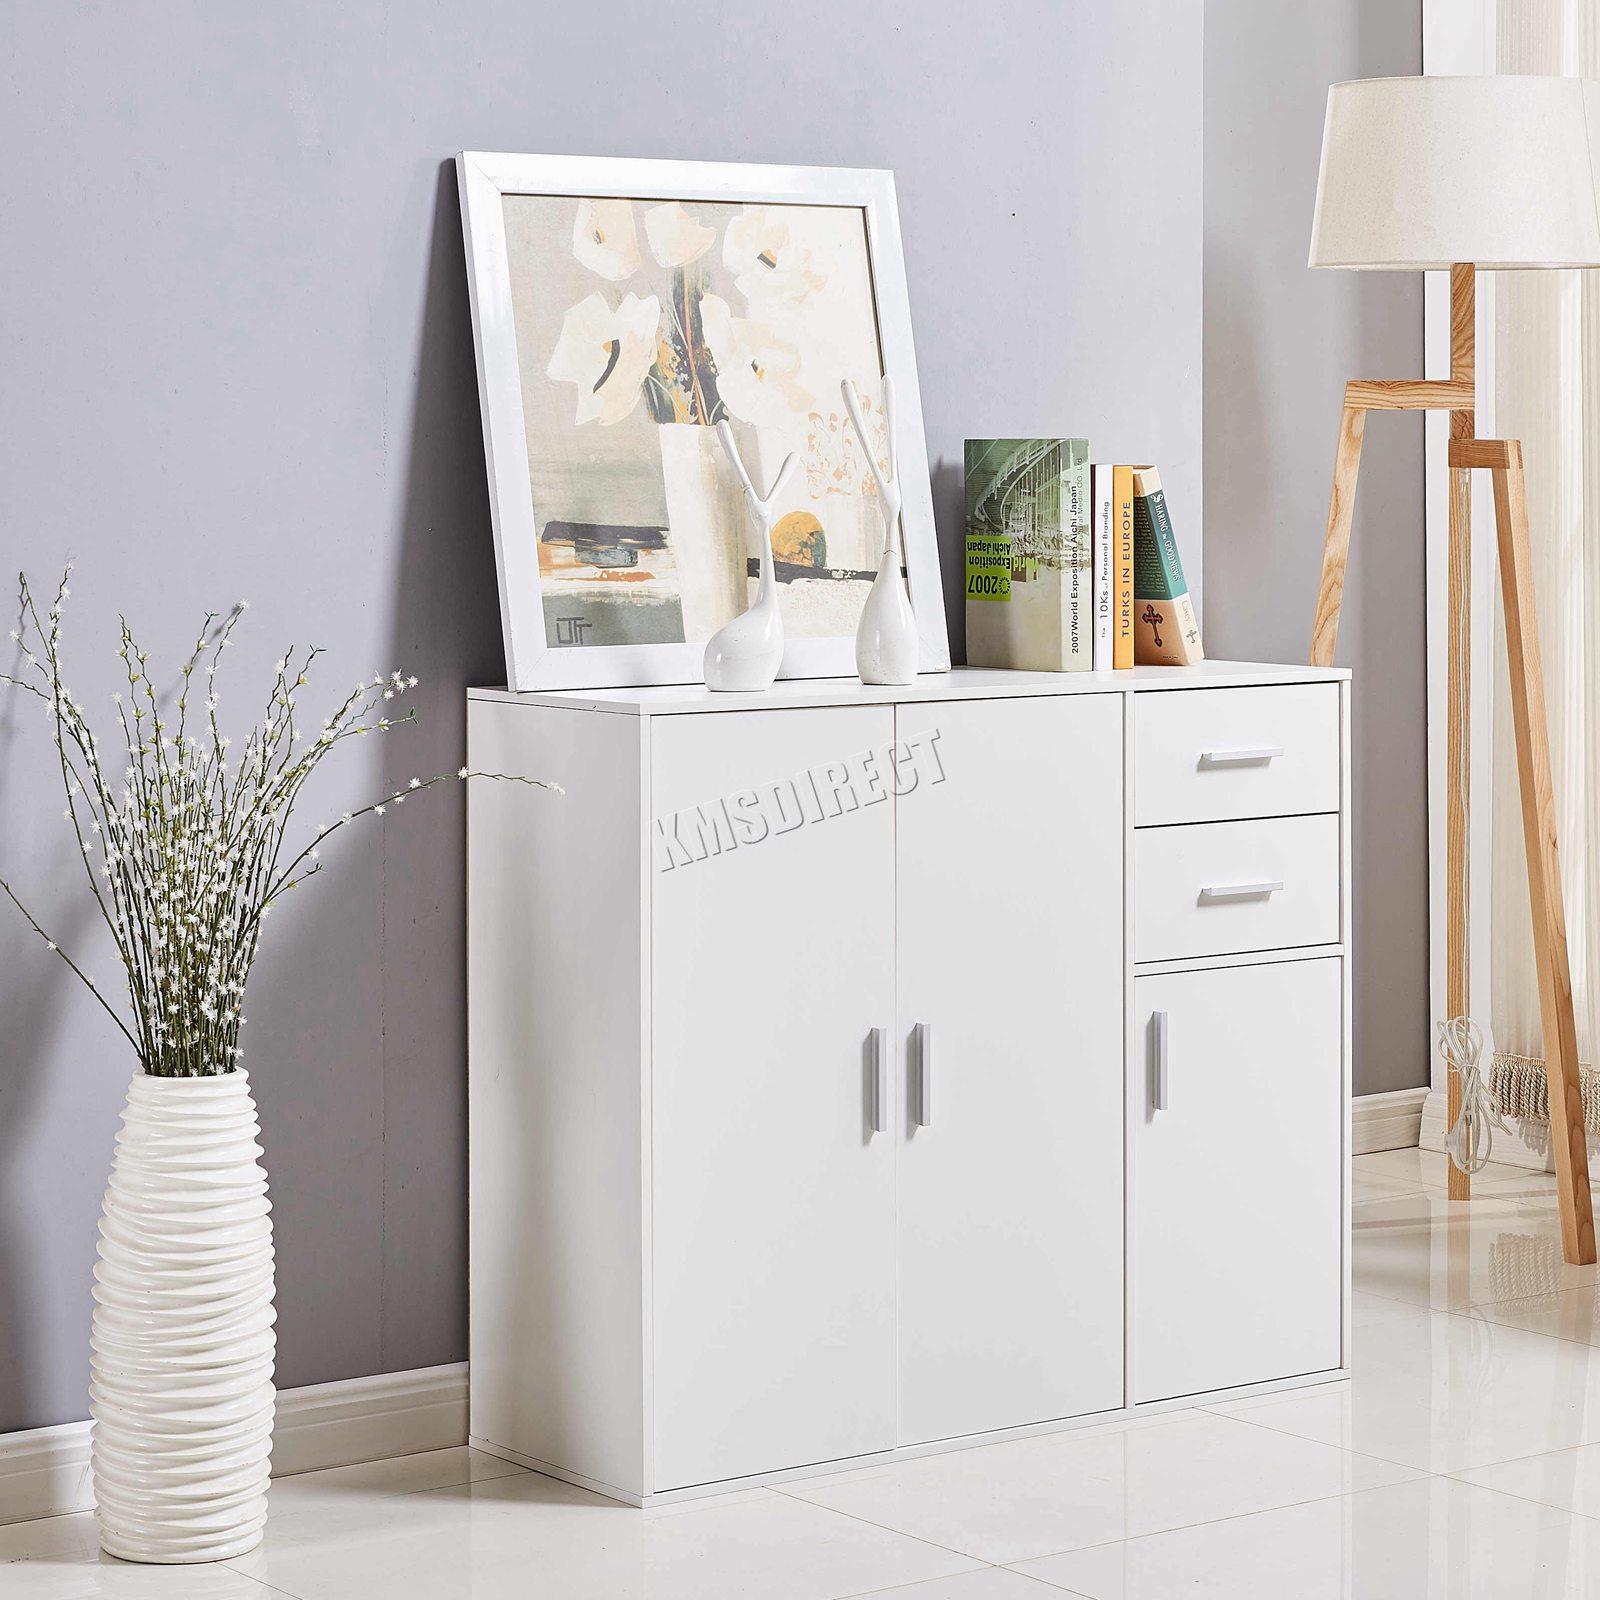 WestWood-Sideboard-Cabinet-Storage-tableware-Kitchen-Cupboard-Unit-PB-SSP01-NEW thumbnail 35